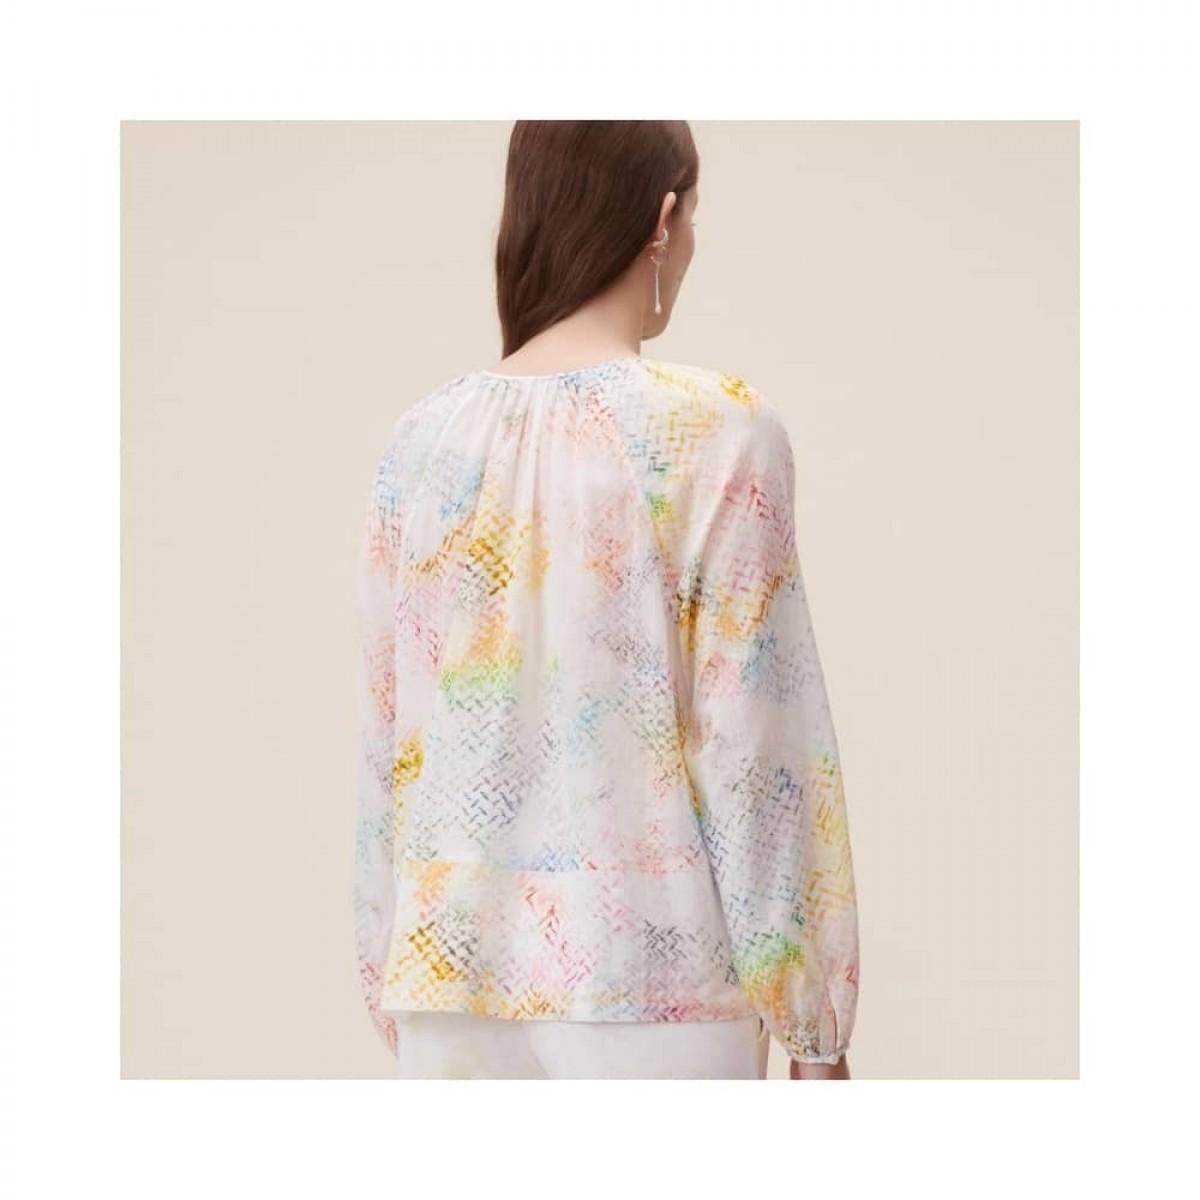 binia bluse - rainbow kufiya - model ryggen